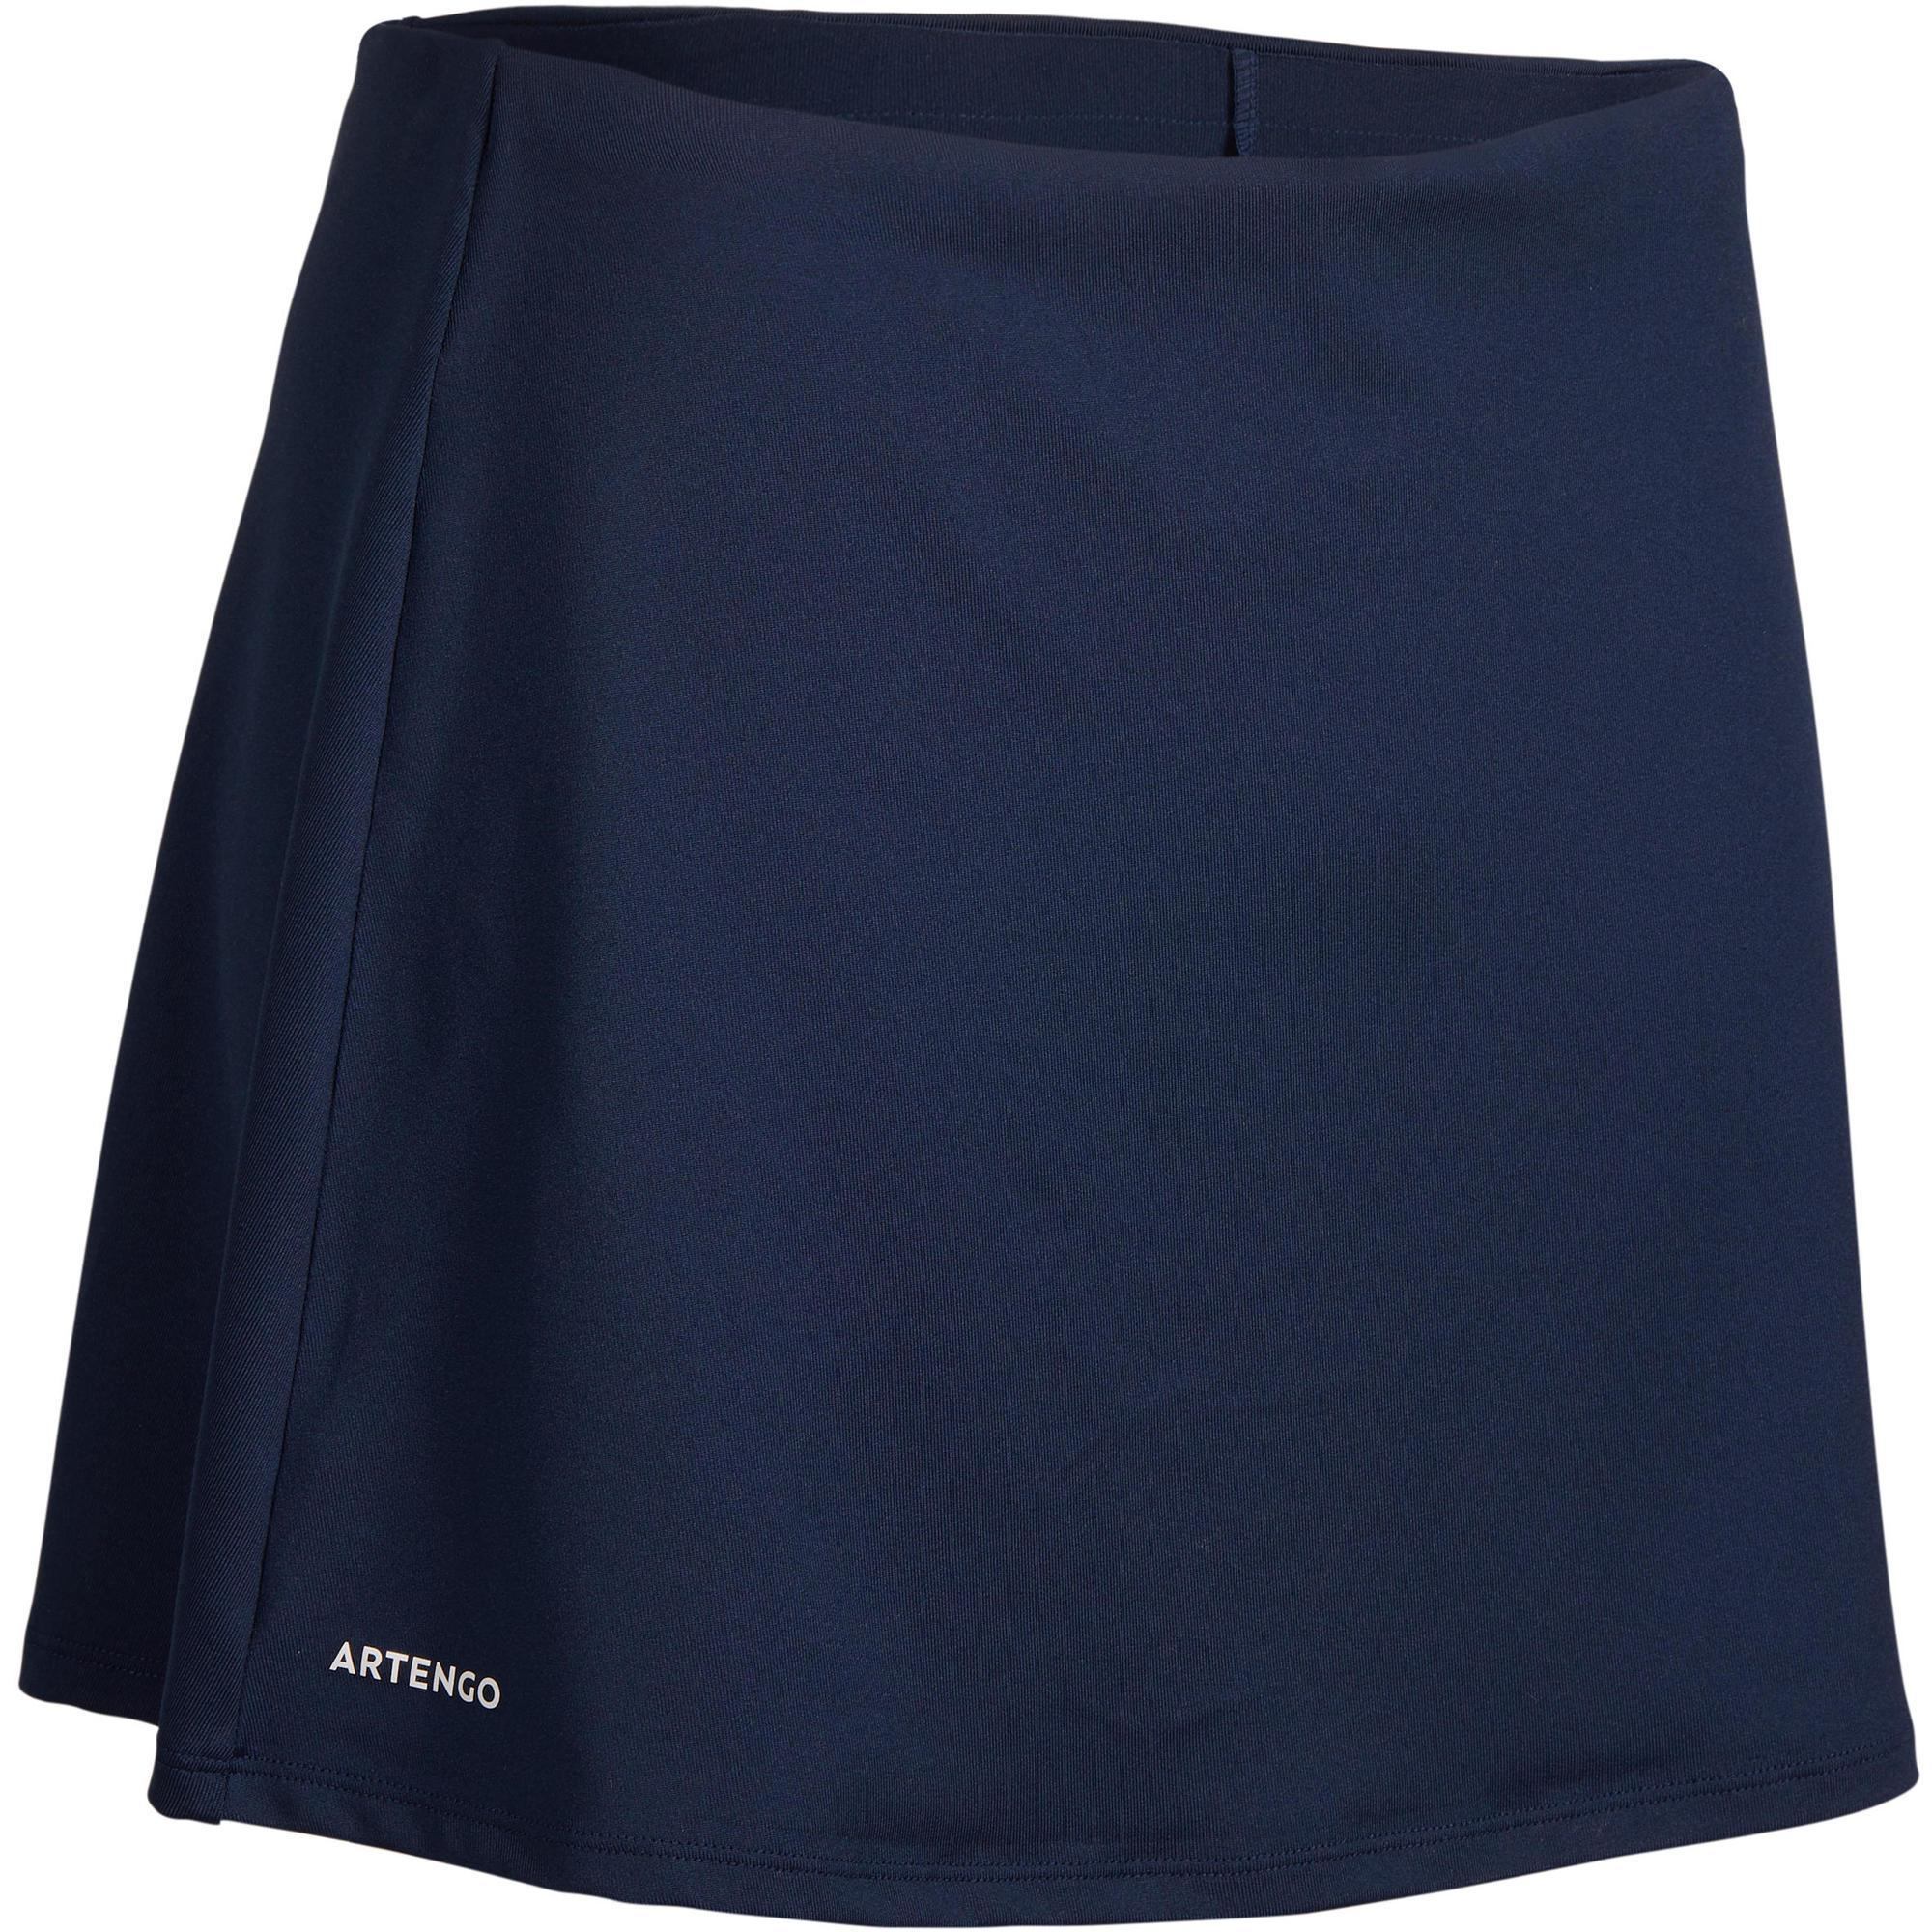 Tennisrock Essential 100 Damen marineblau | Sportbekleidung > Sportröcke > Tennisröcke | Artengo